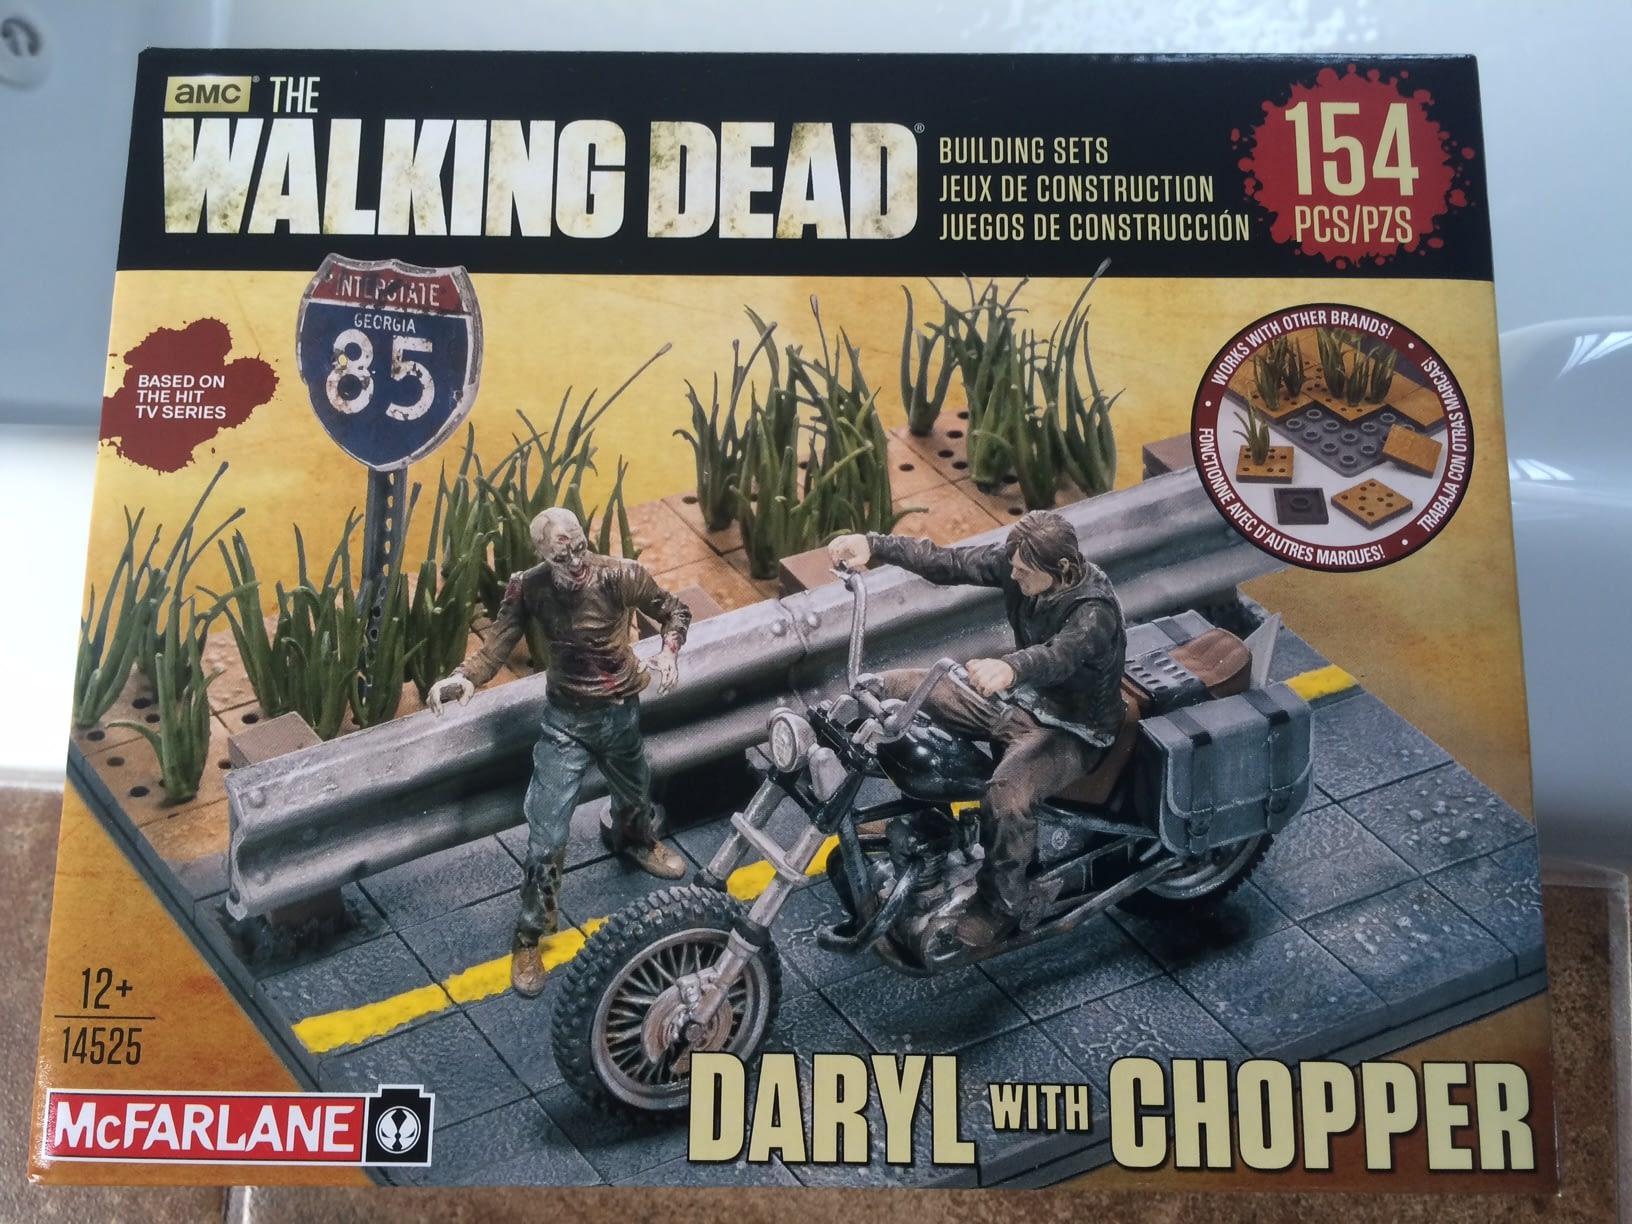 MCFARLANE THE WALKING DEAD AMC BUILDING SETS DARYL WITH CHOPPER 14525 154PCS!